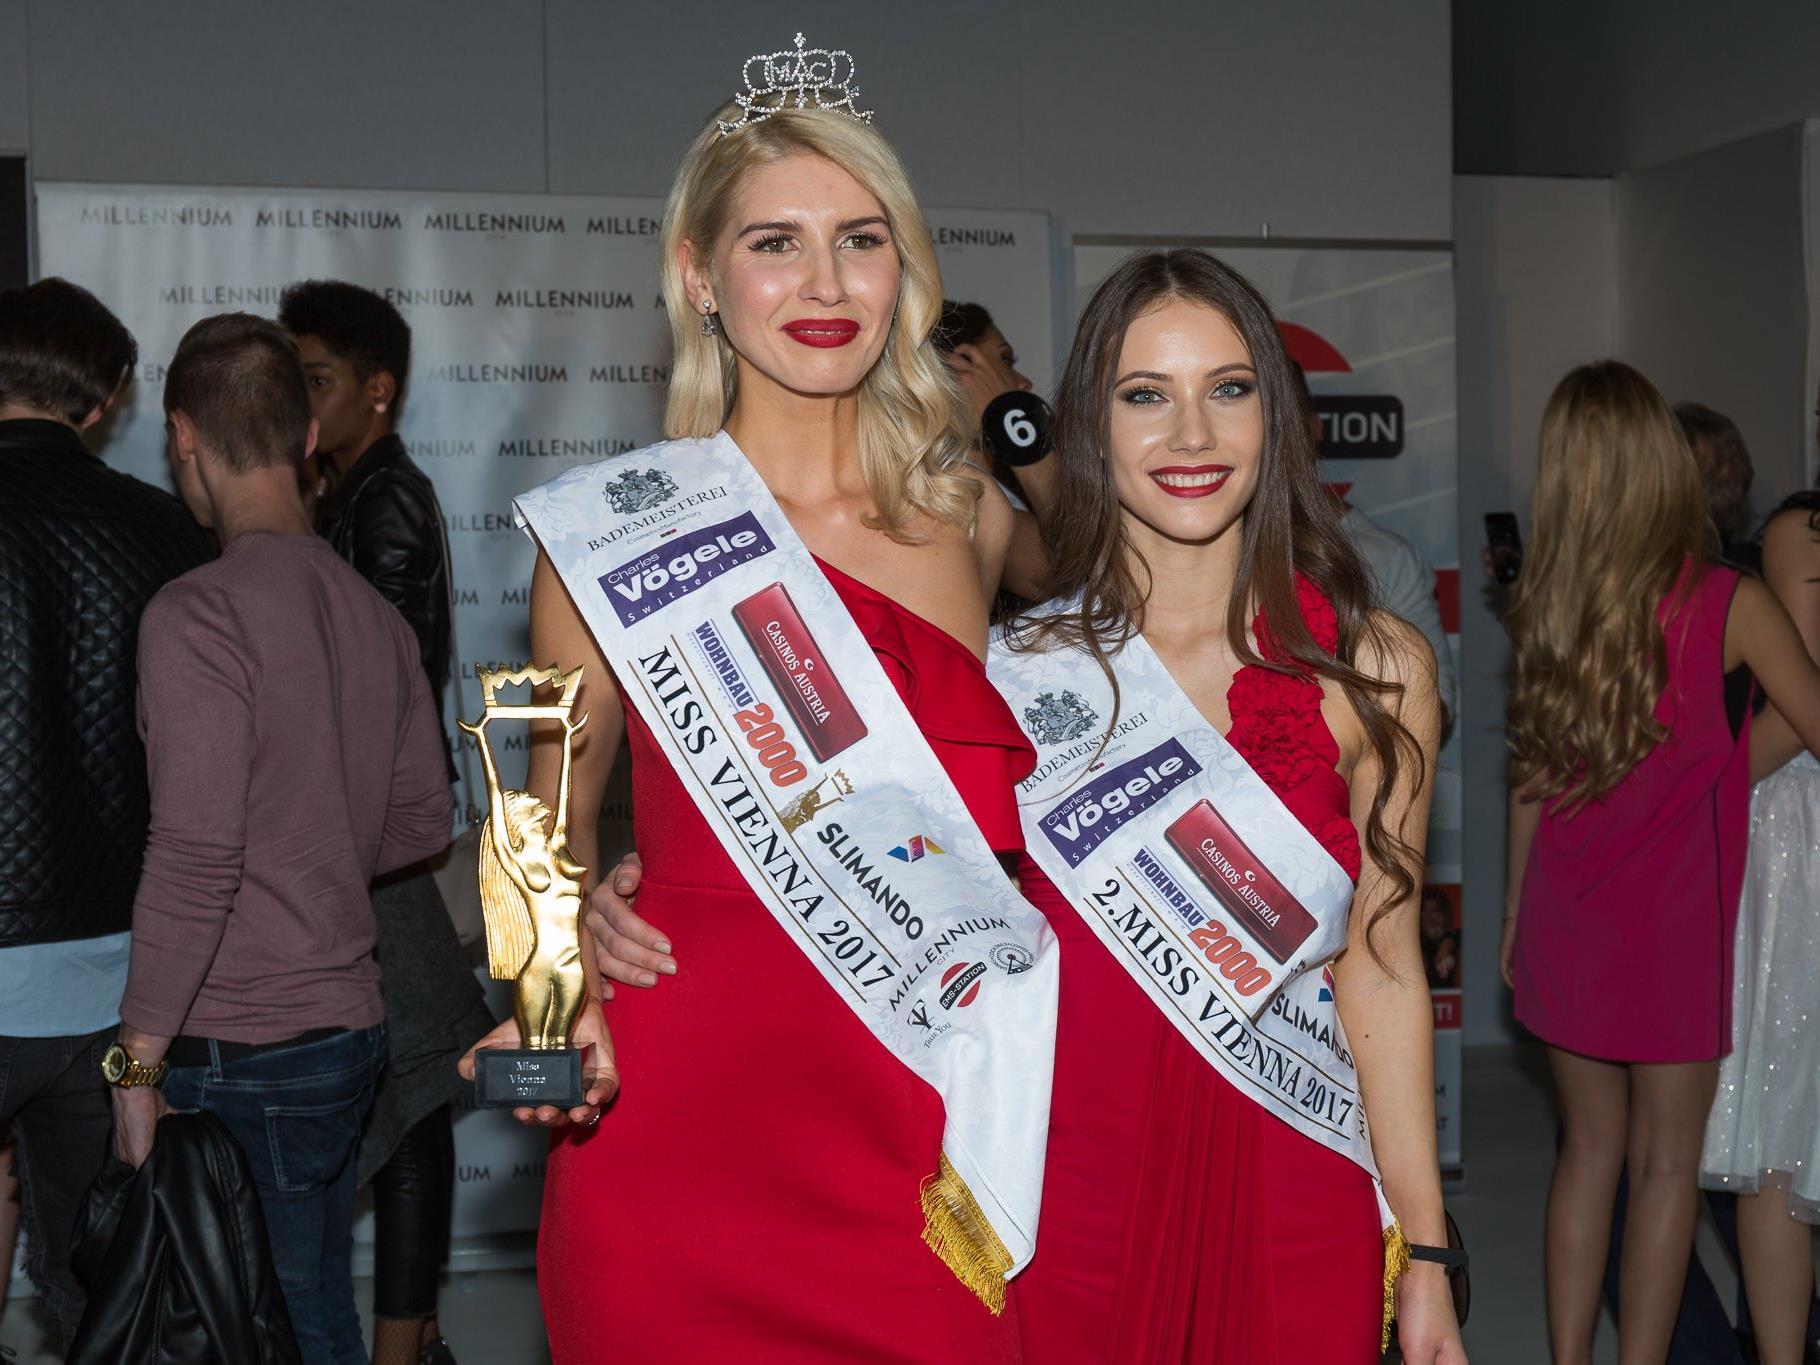 Elisa Dedu aus Wien-Floridsdorf wurde Miss Vienna 2017.